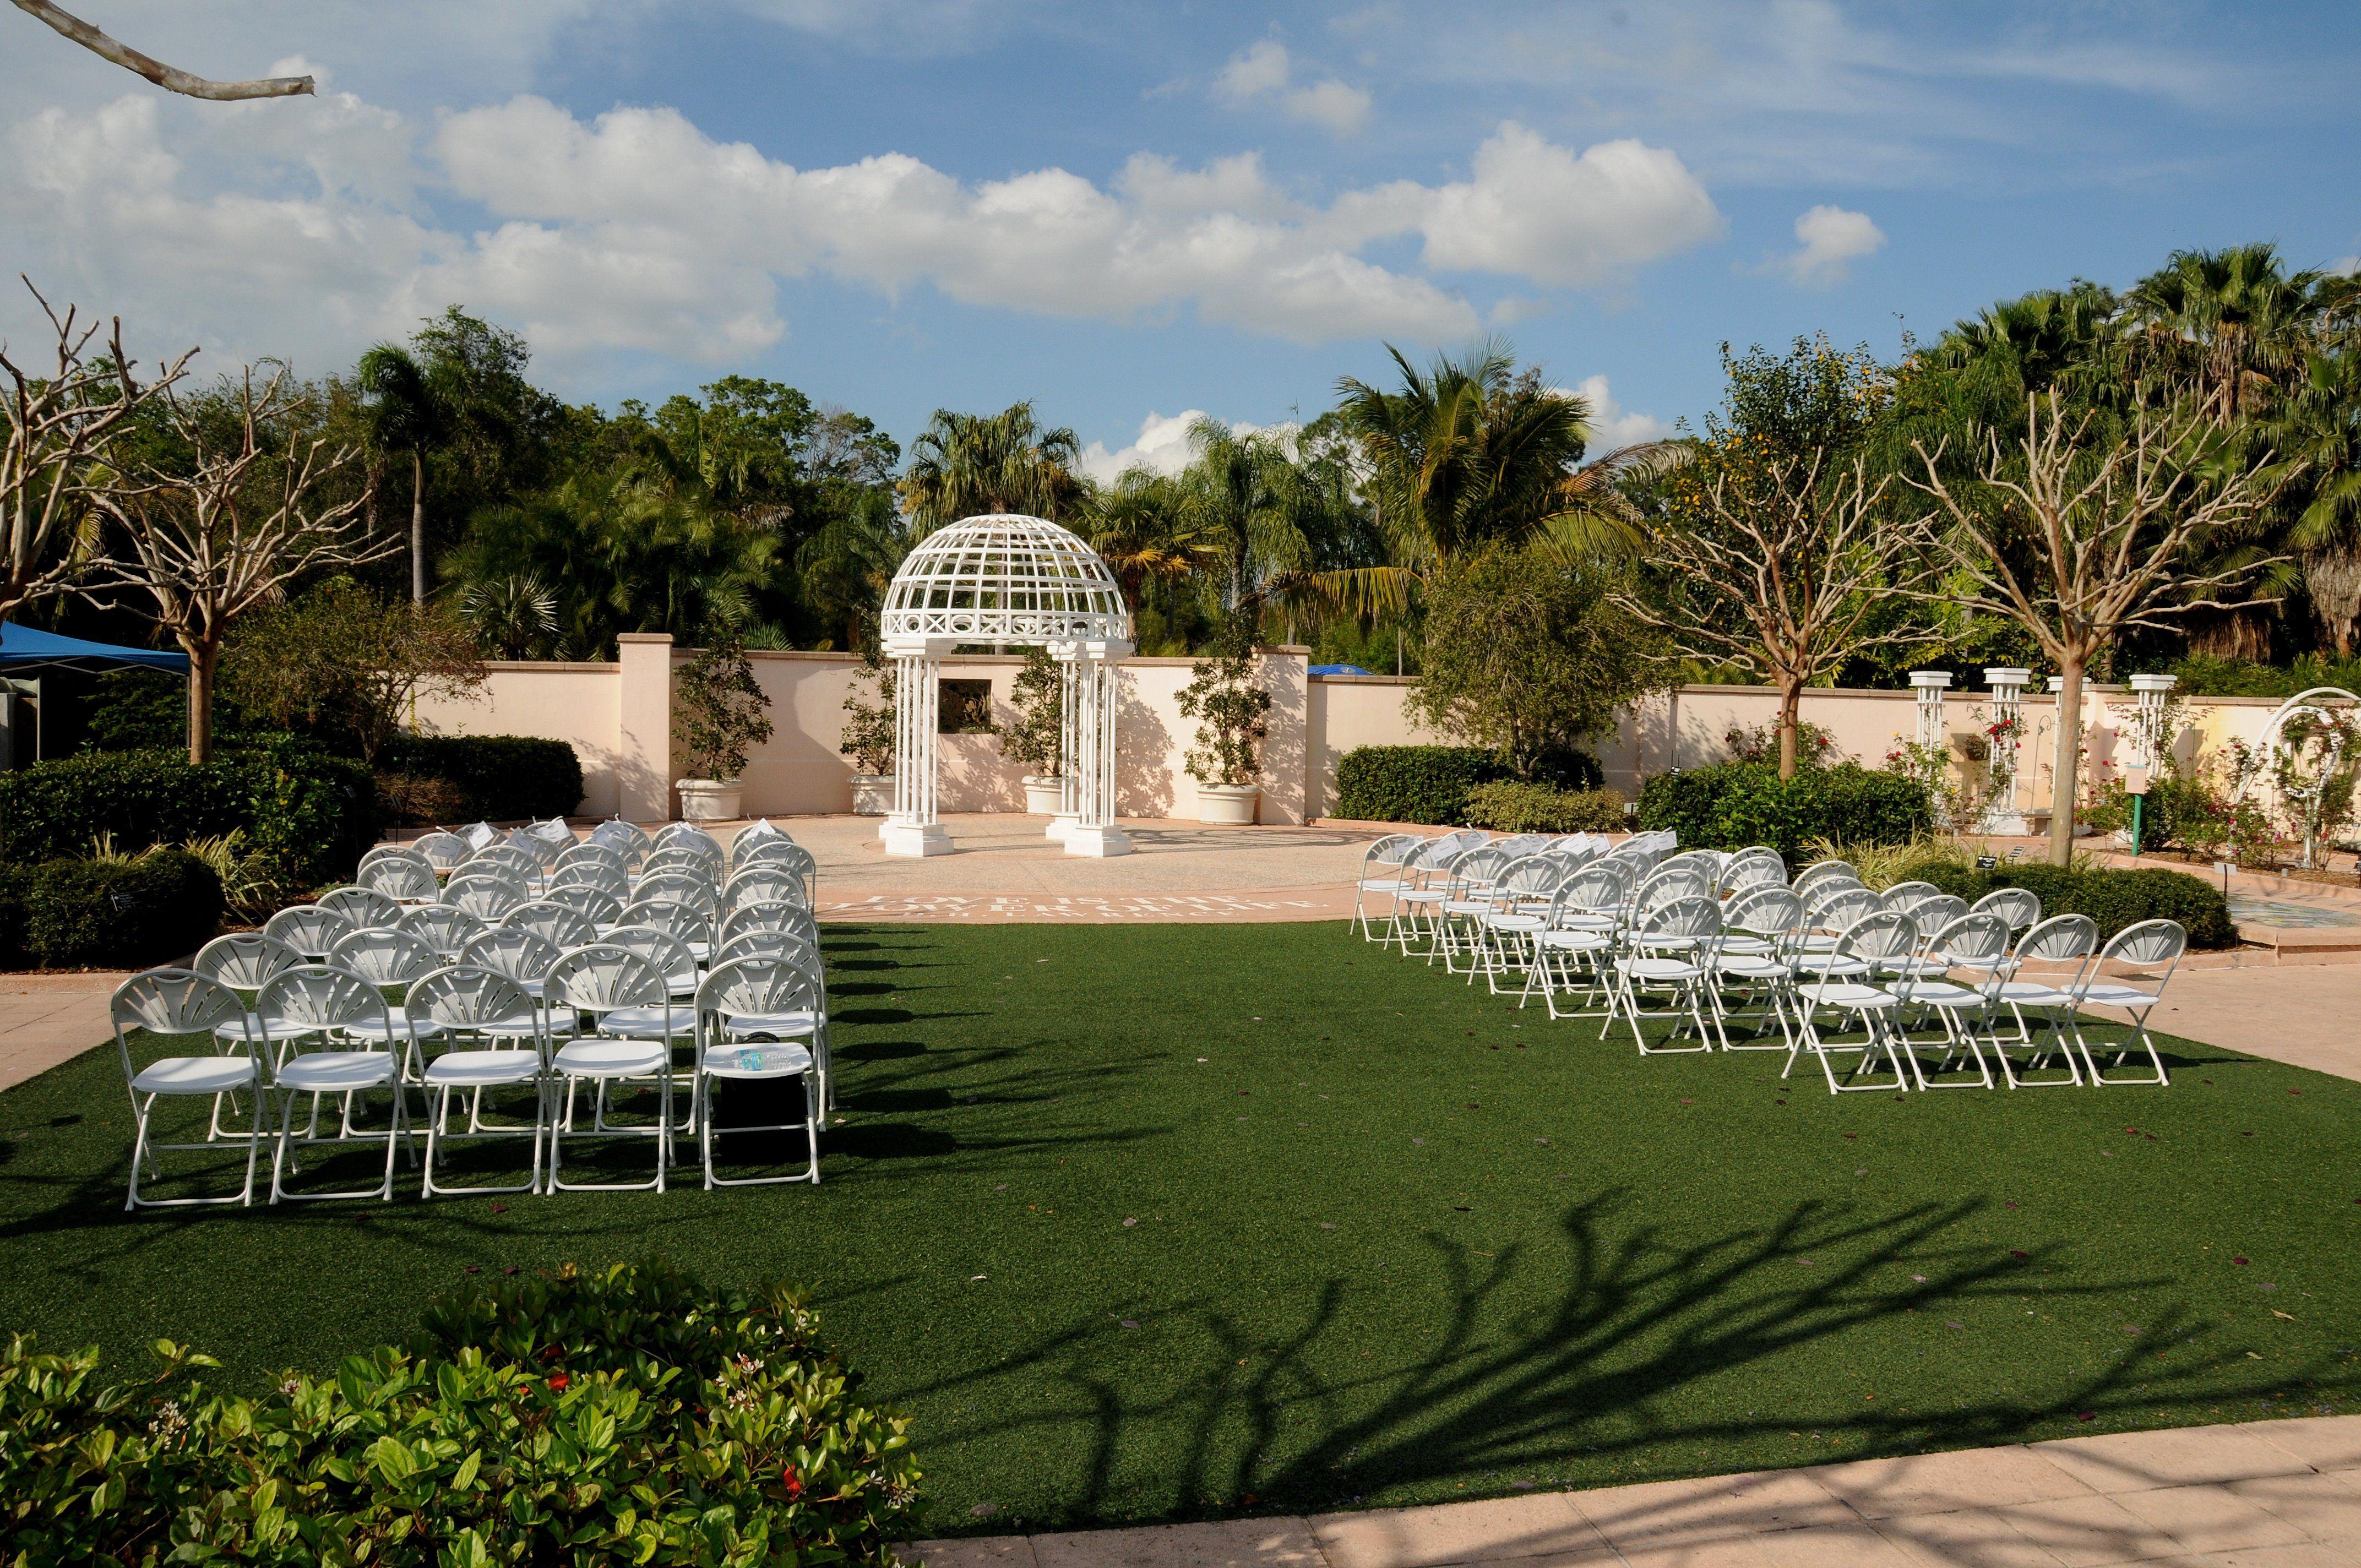 Florida Botanical Gardens Largo Fl Weddinggarden Orangeblossomcatering Ceremony Outdoor Devant